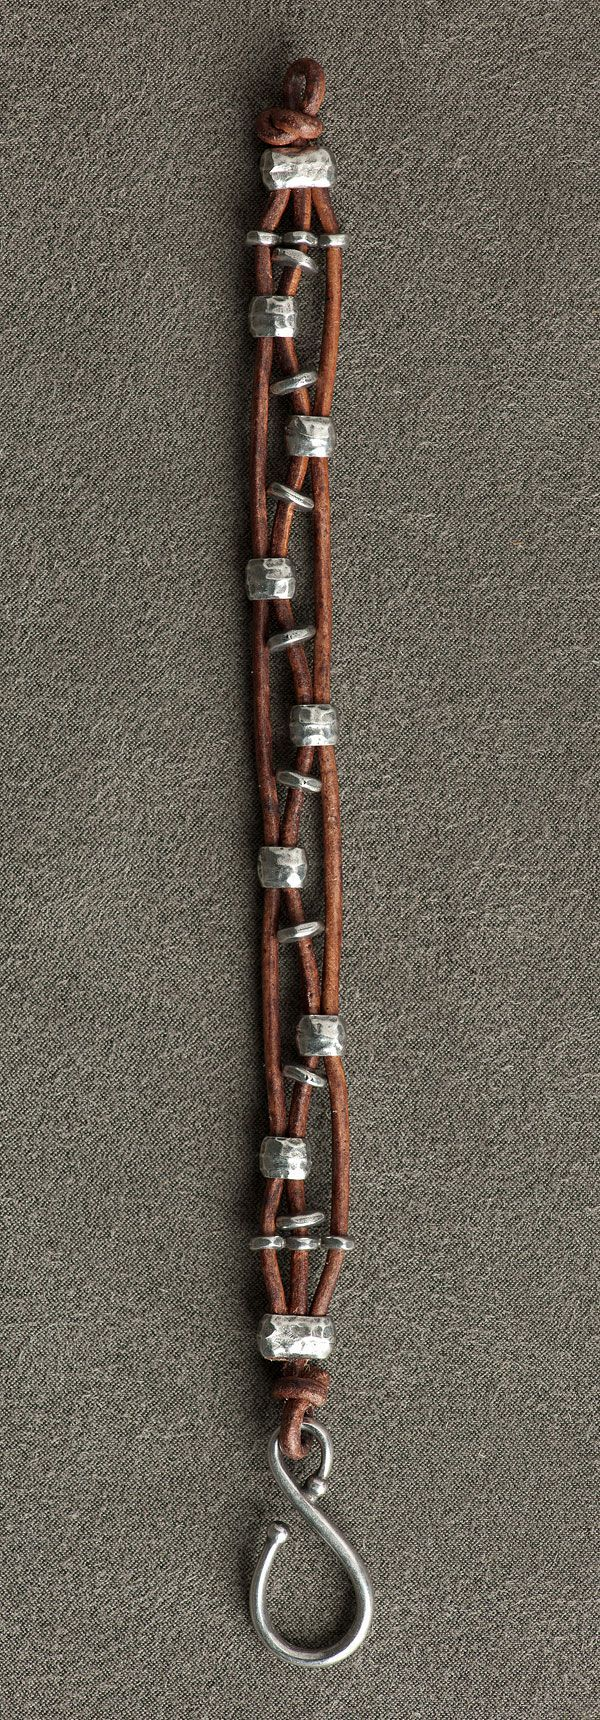 nice TierraCast - Lazy Zigzag Bracelet                                                                                                                                                                                 More                                                                                                                                                                                 More